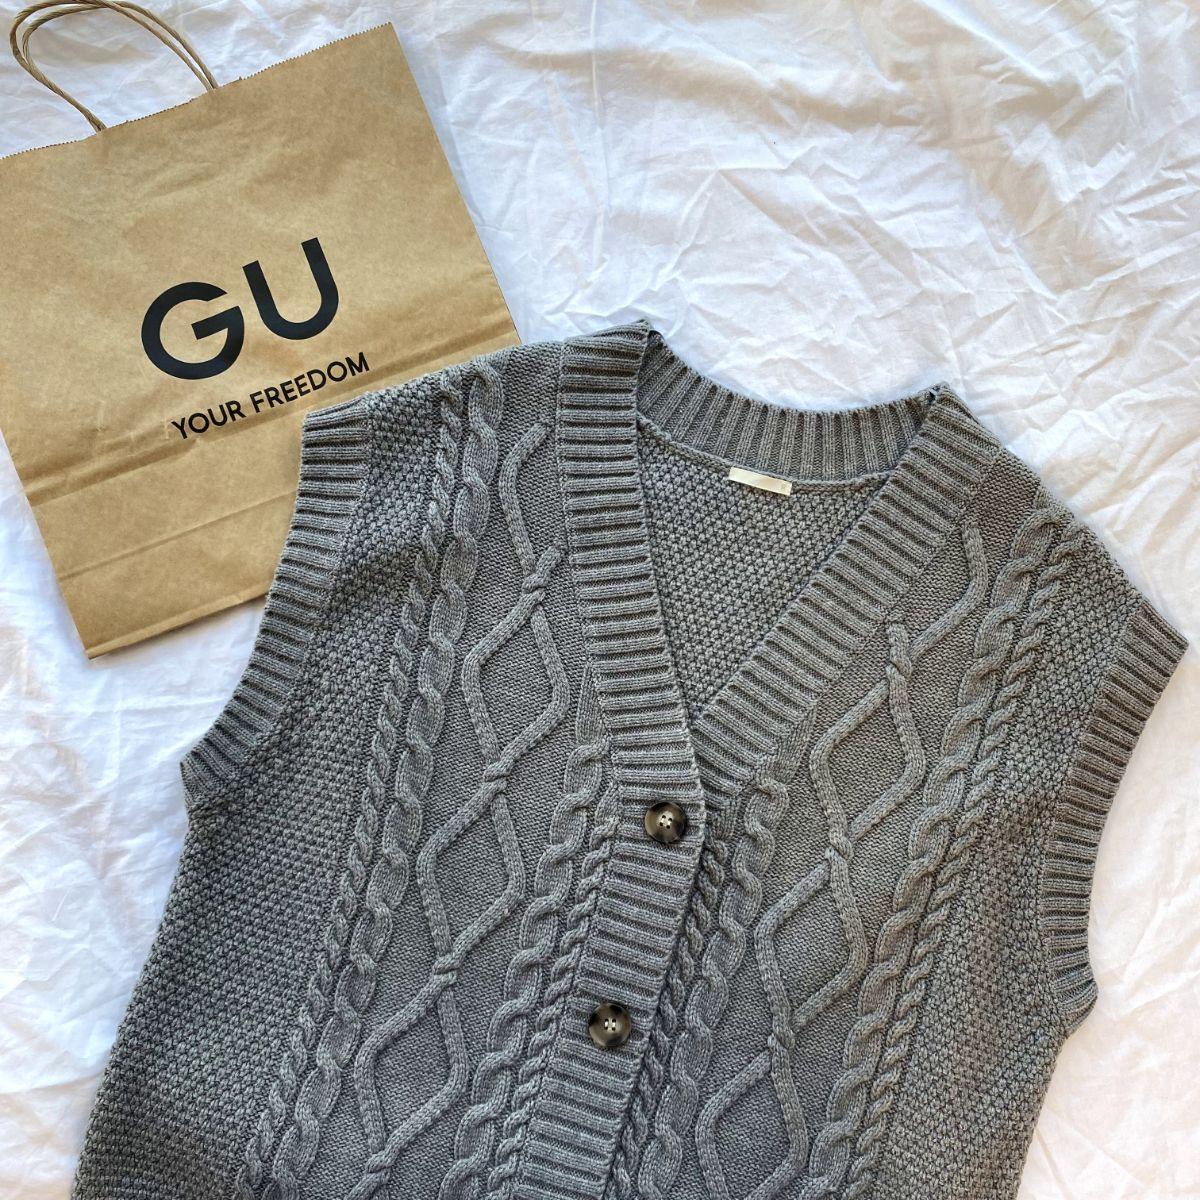 【GUレポ】このざっくり感がかわいいんです。「ケーブルニットベスト」で秋コーデに差をつけて